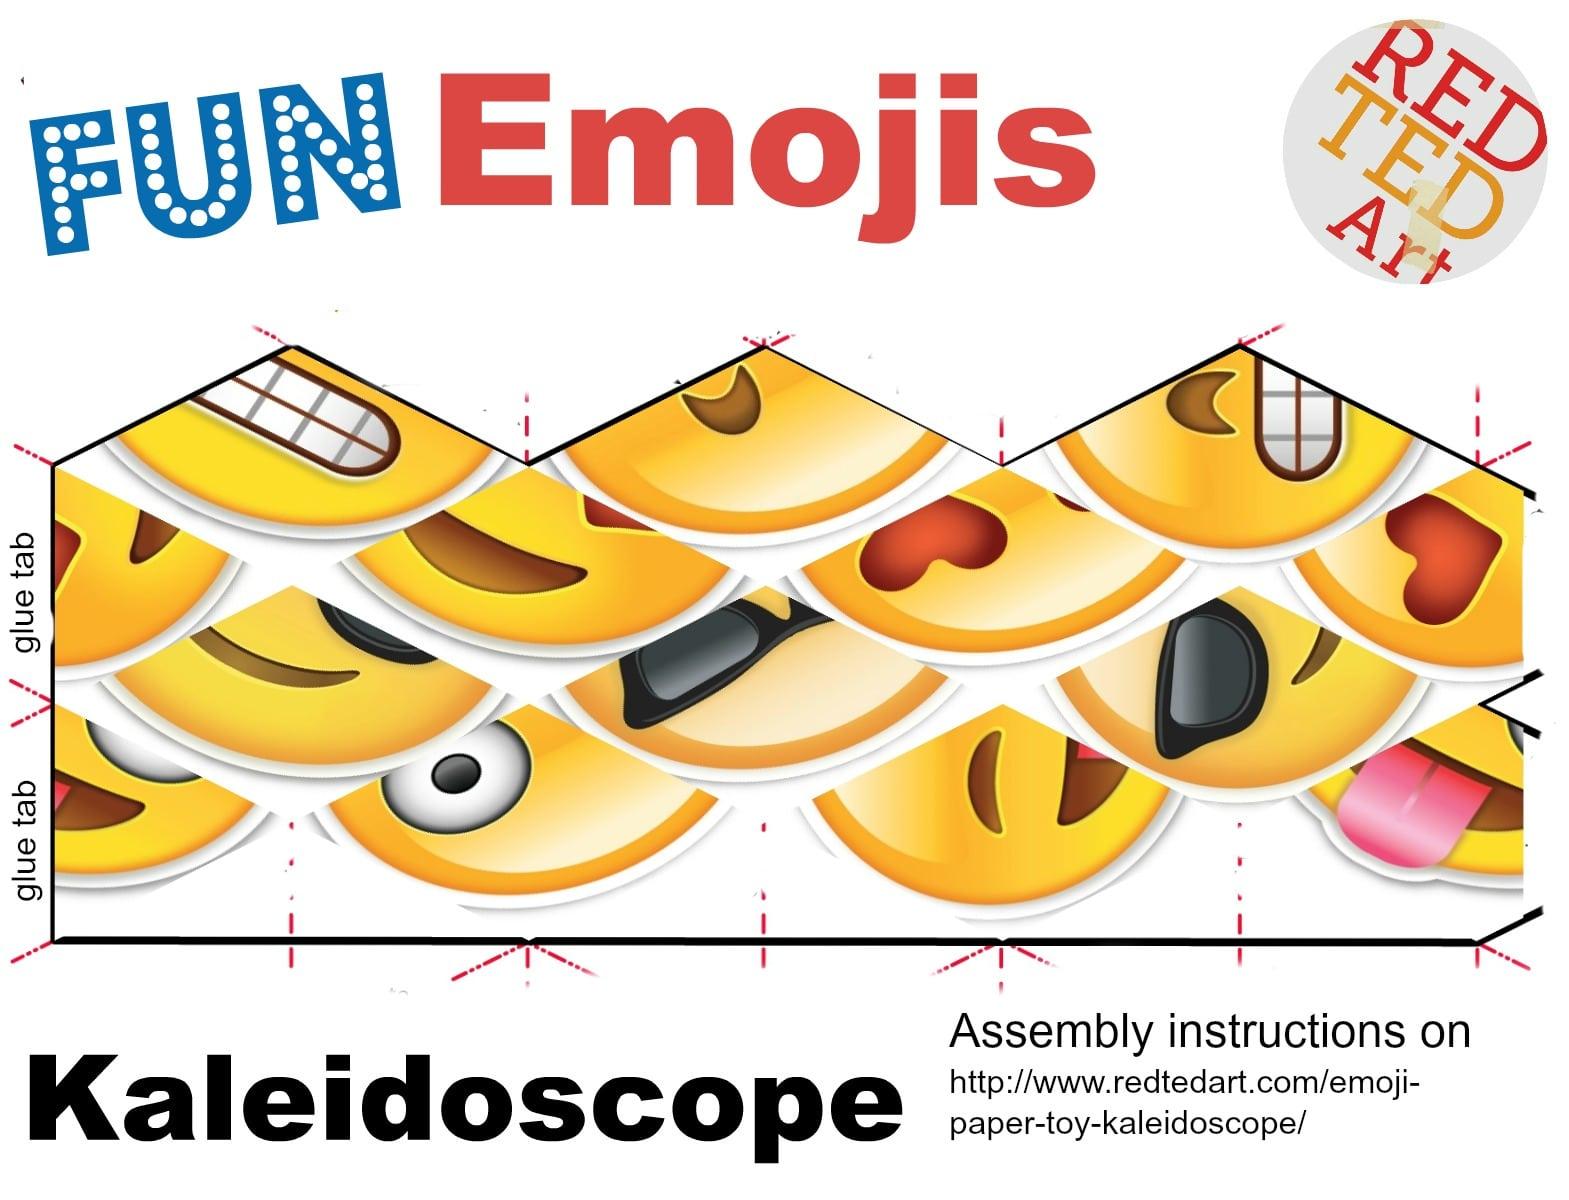 Emoji Paper Toy Kaleidoscope - Red Ted Art's Blog - photo#23